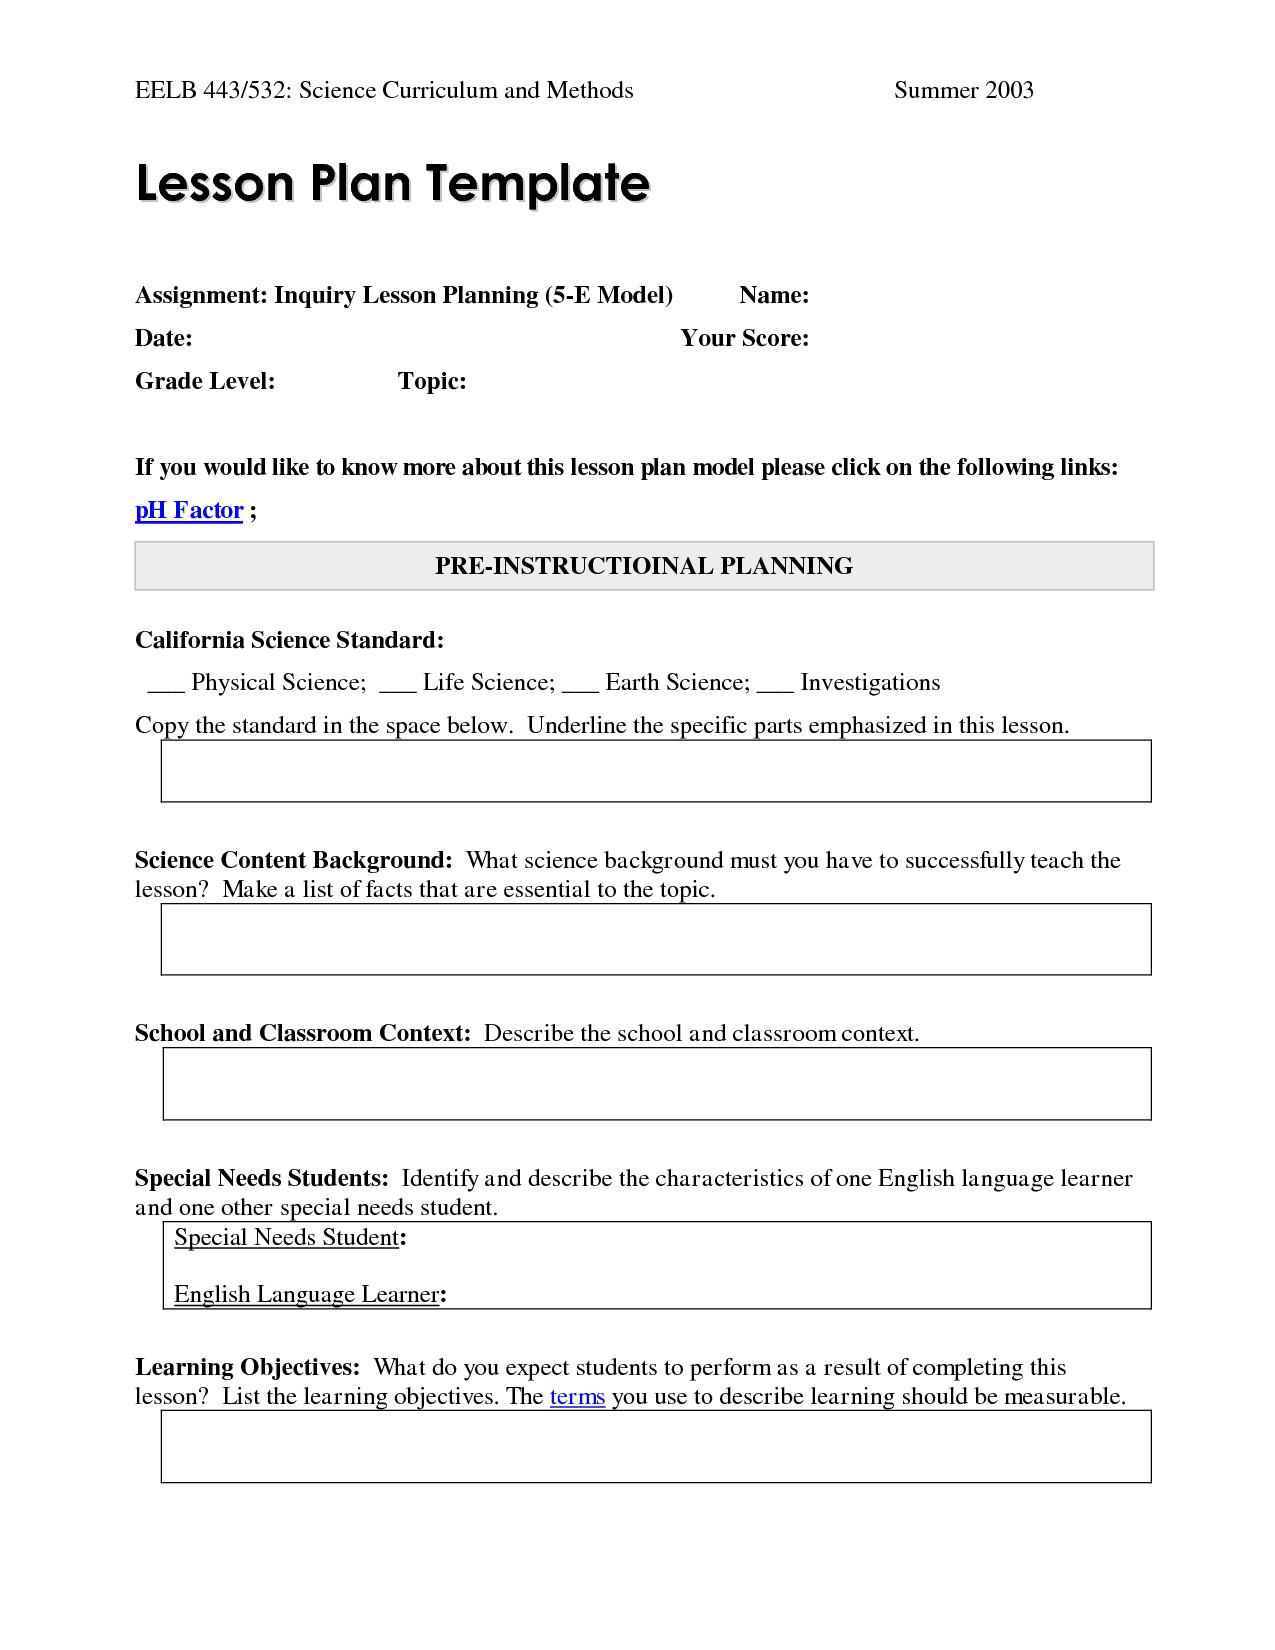 post blank 5e lesson plan 840952